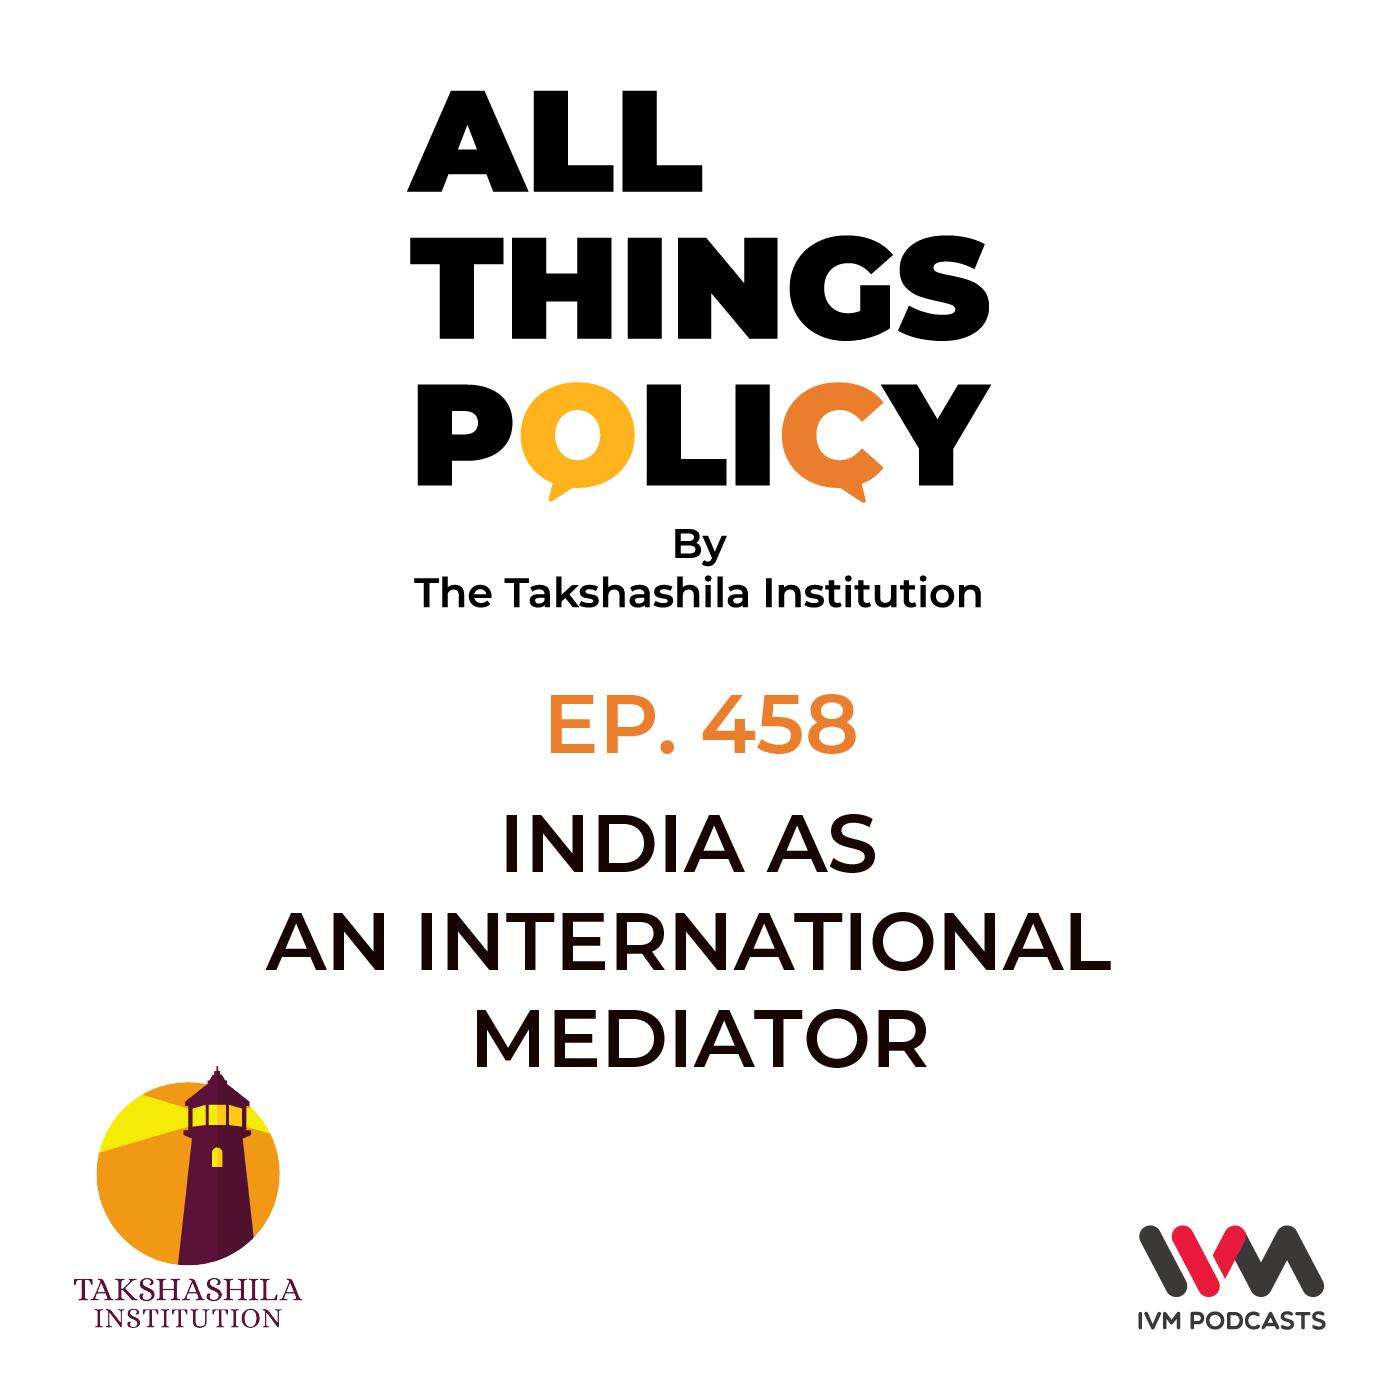 Ep. 458: India's Marathon: Raja Karthikeya on India as an International Mediator